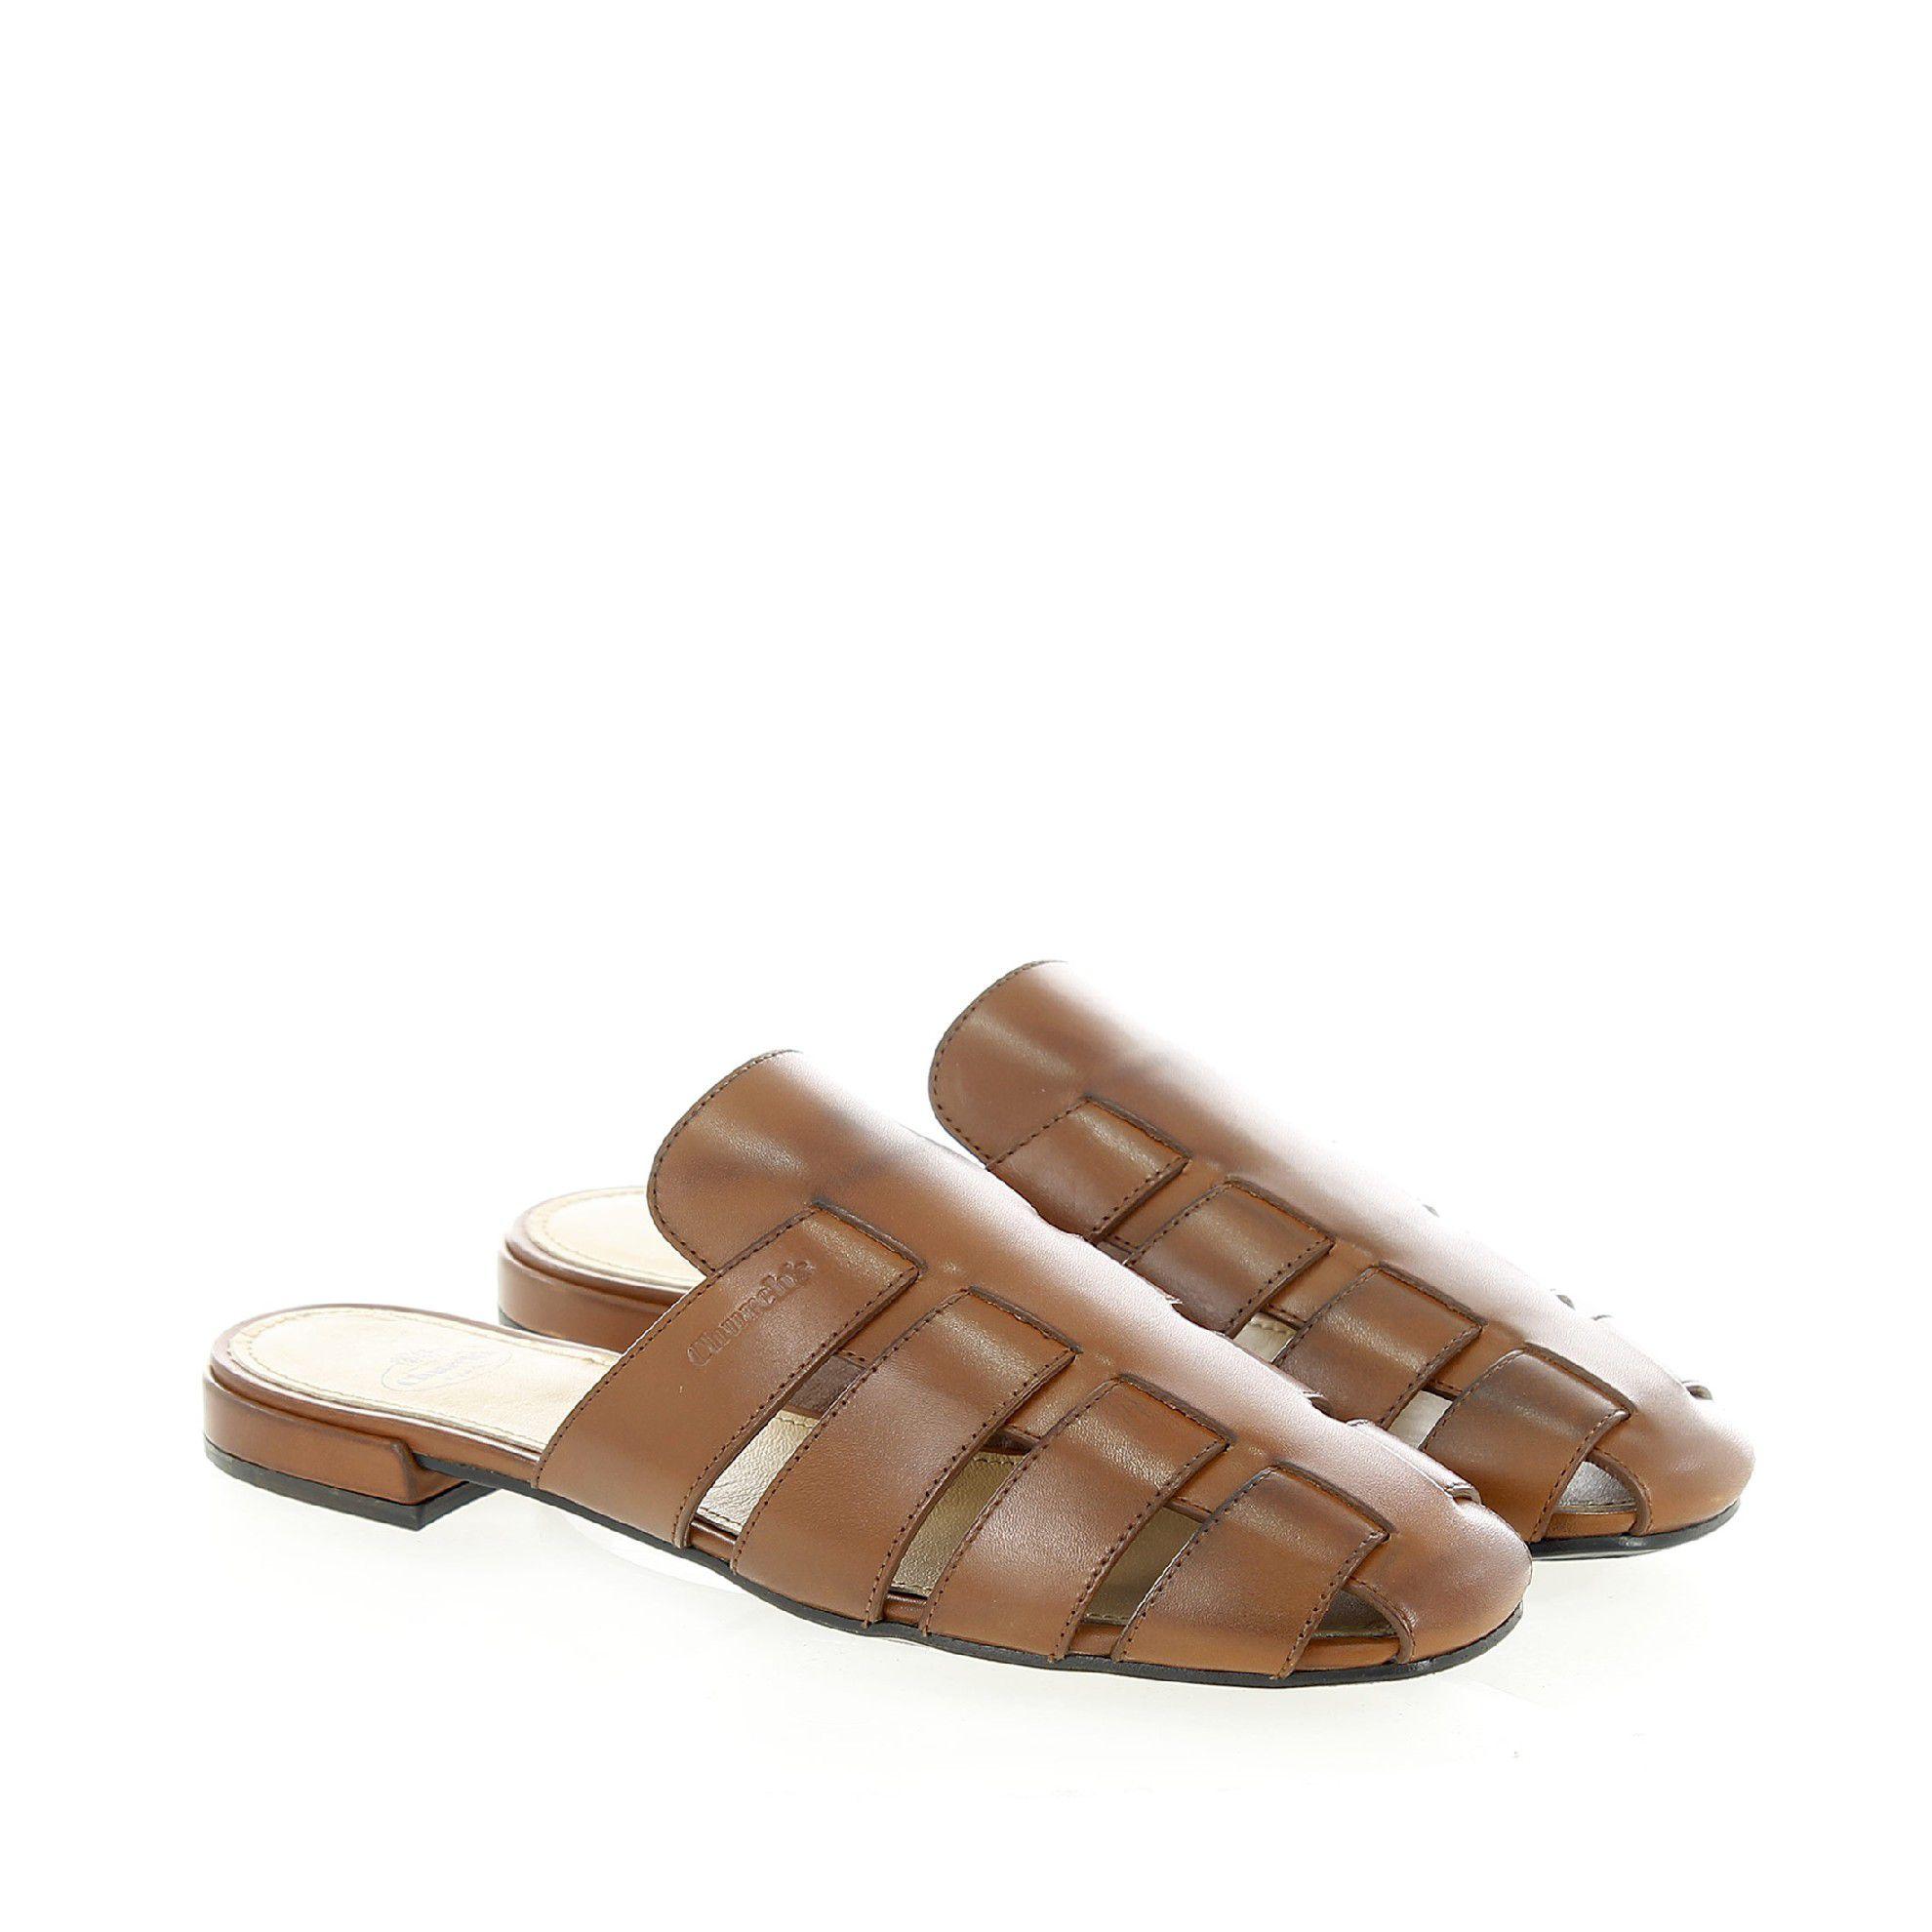 Church's sandalo flat in pelle da donna